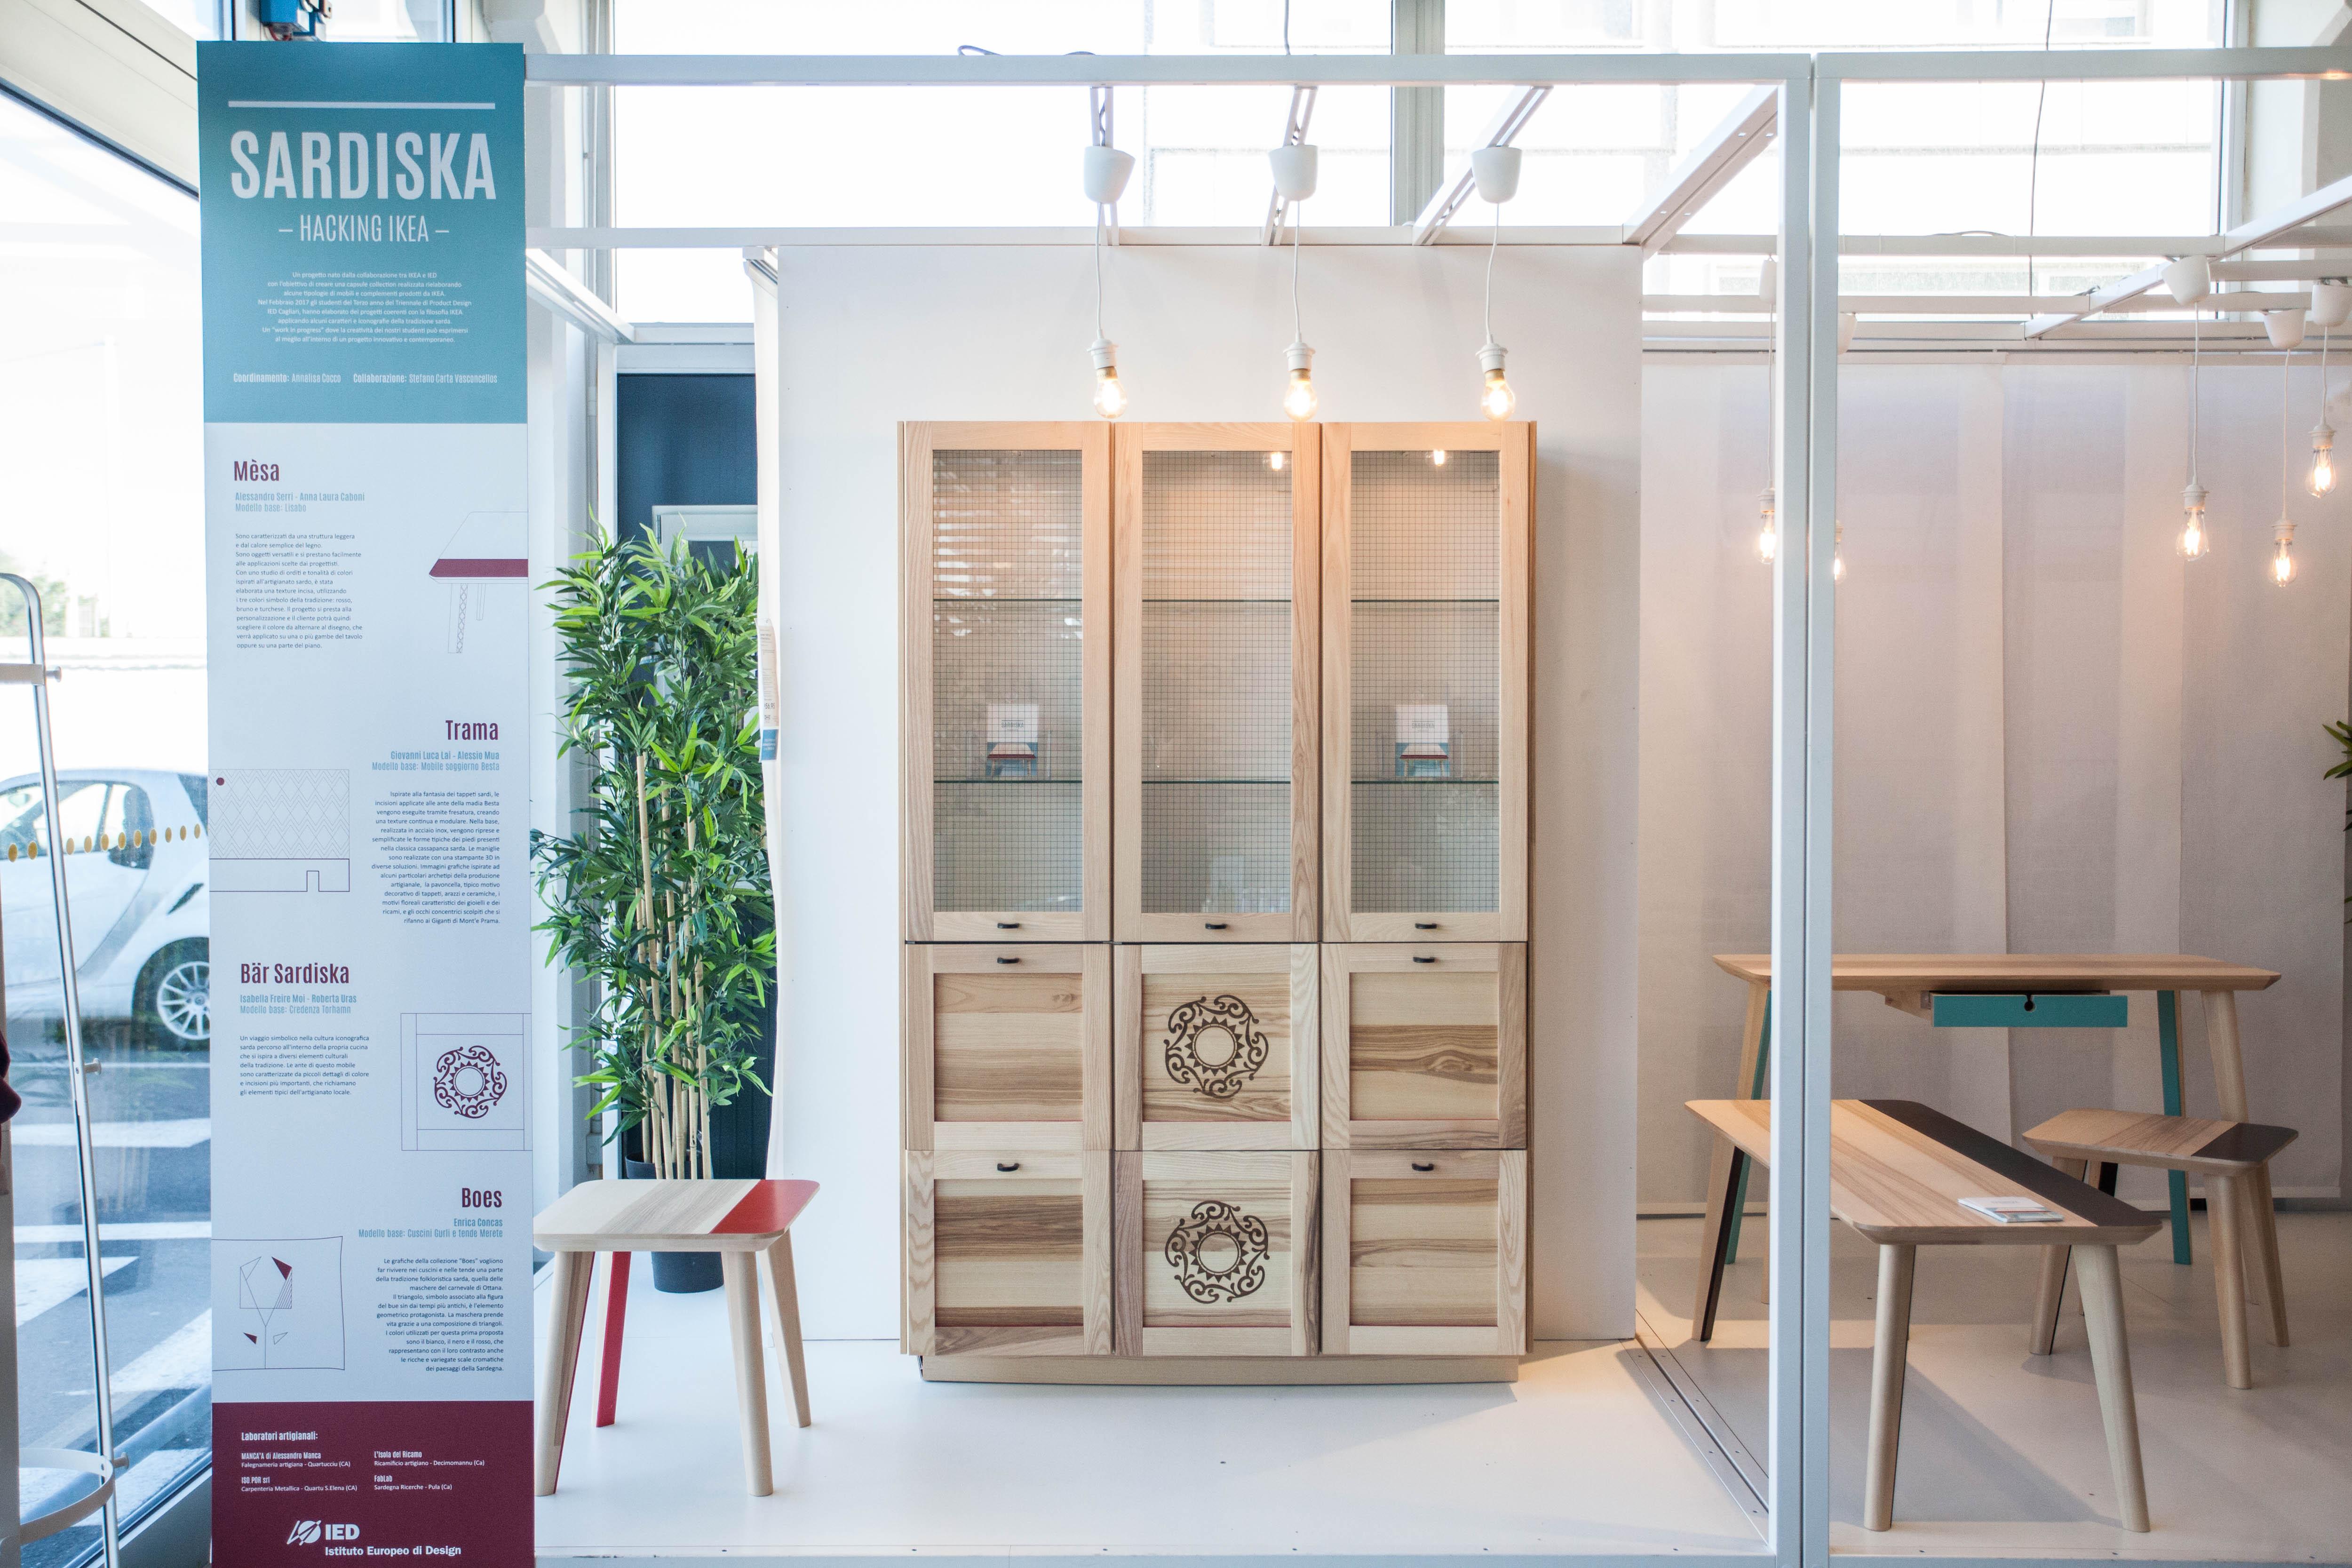 Mobili Credenza Ikea : Sardiska ecco i mobili ikea rivisitati in chiave sarda